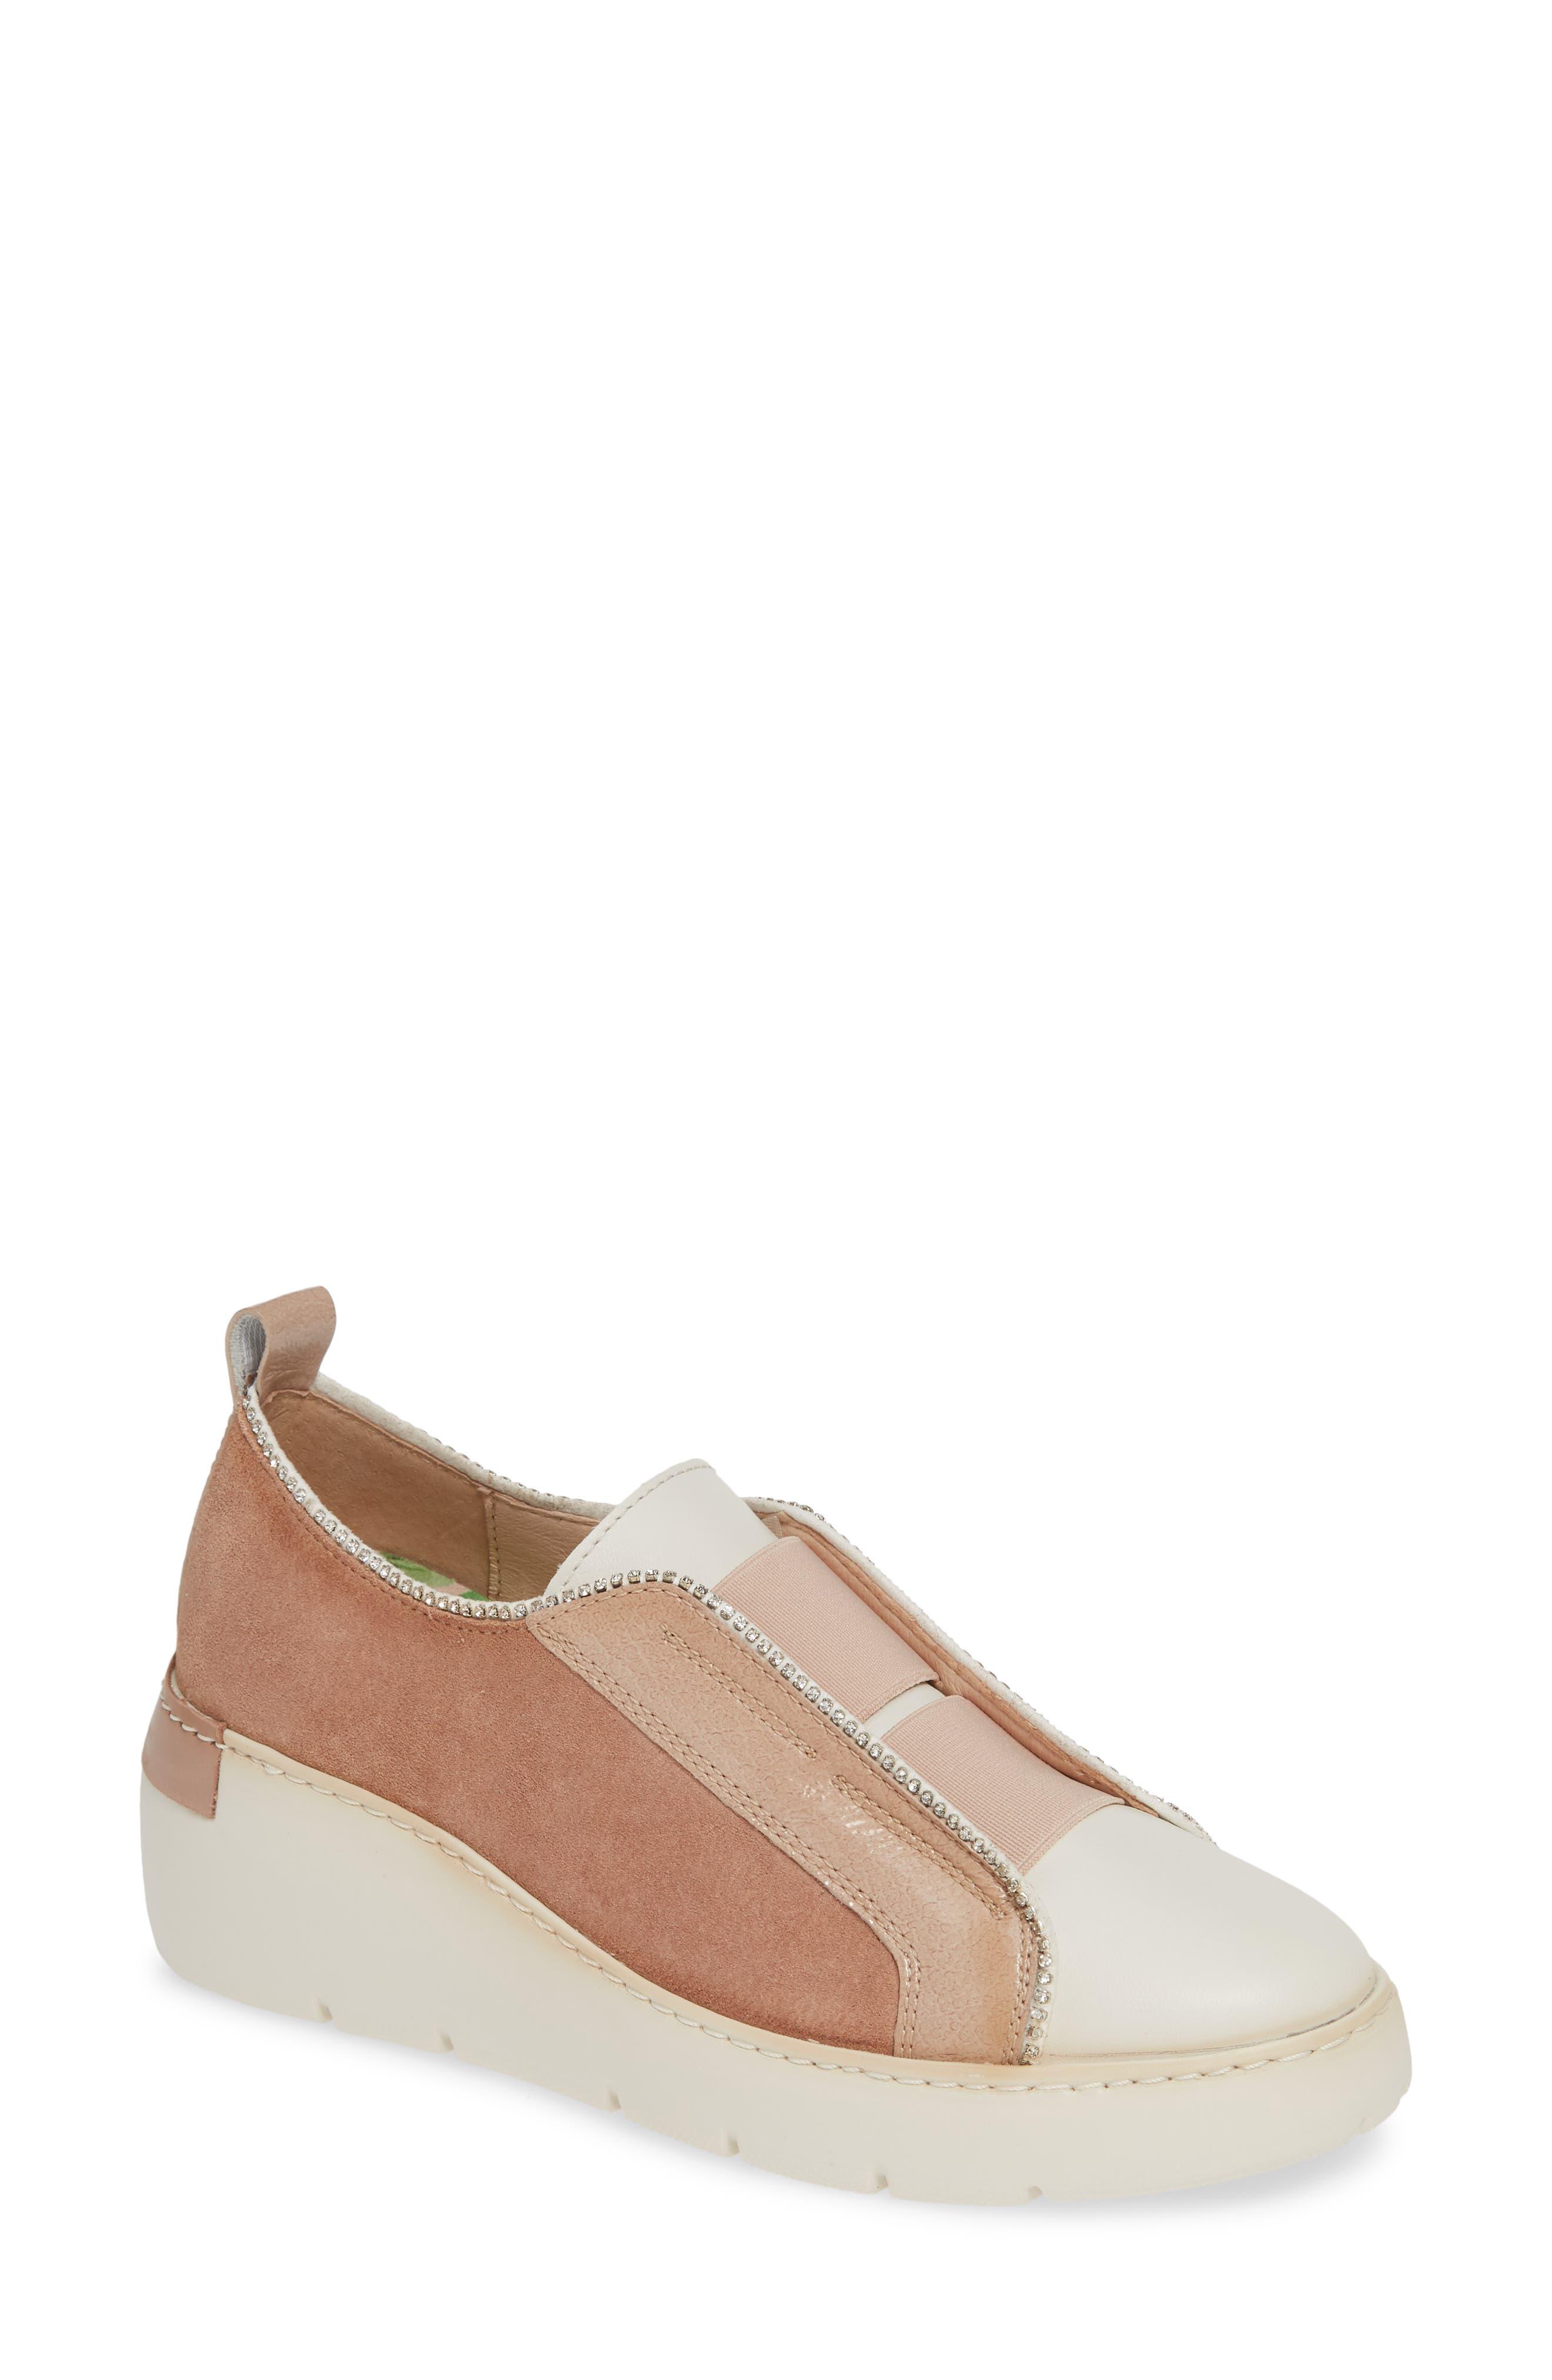 HISPANITAS Benton Slip-On Wedge Sneaker, Main, color, VELOUR FLESH LEATHER